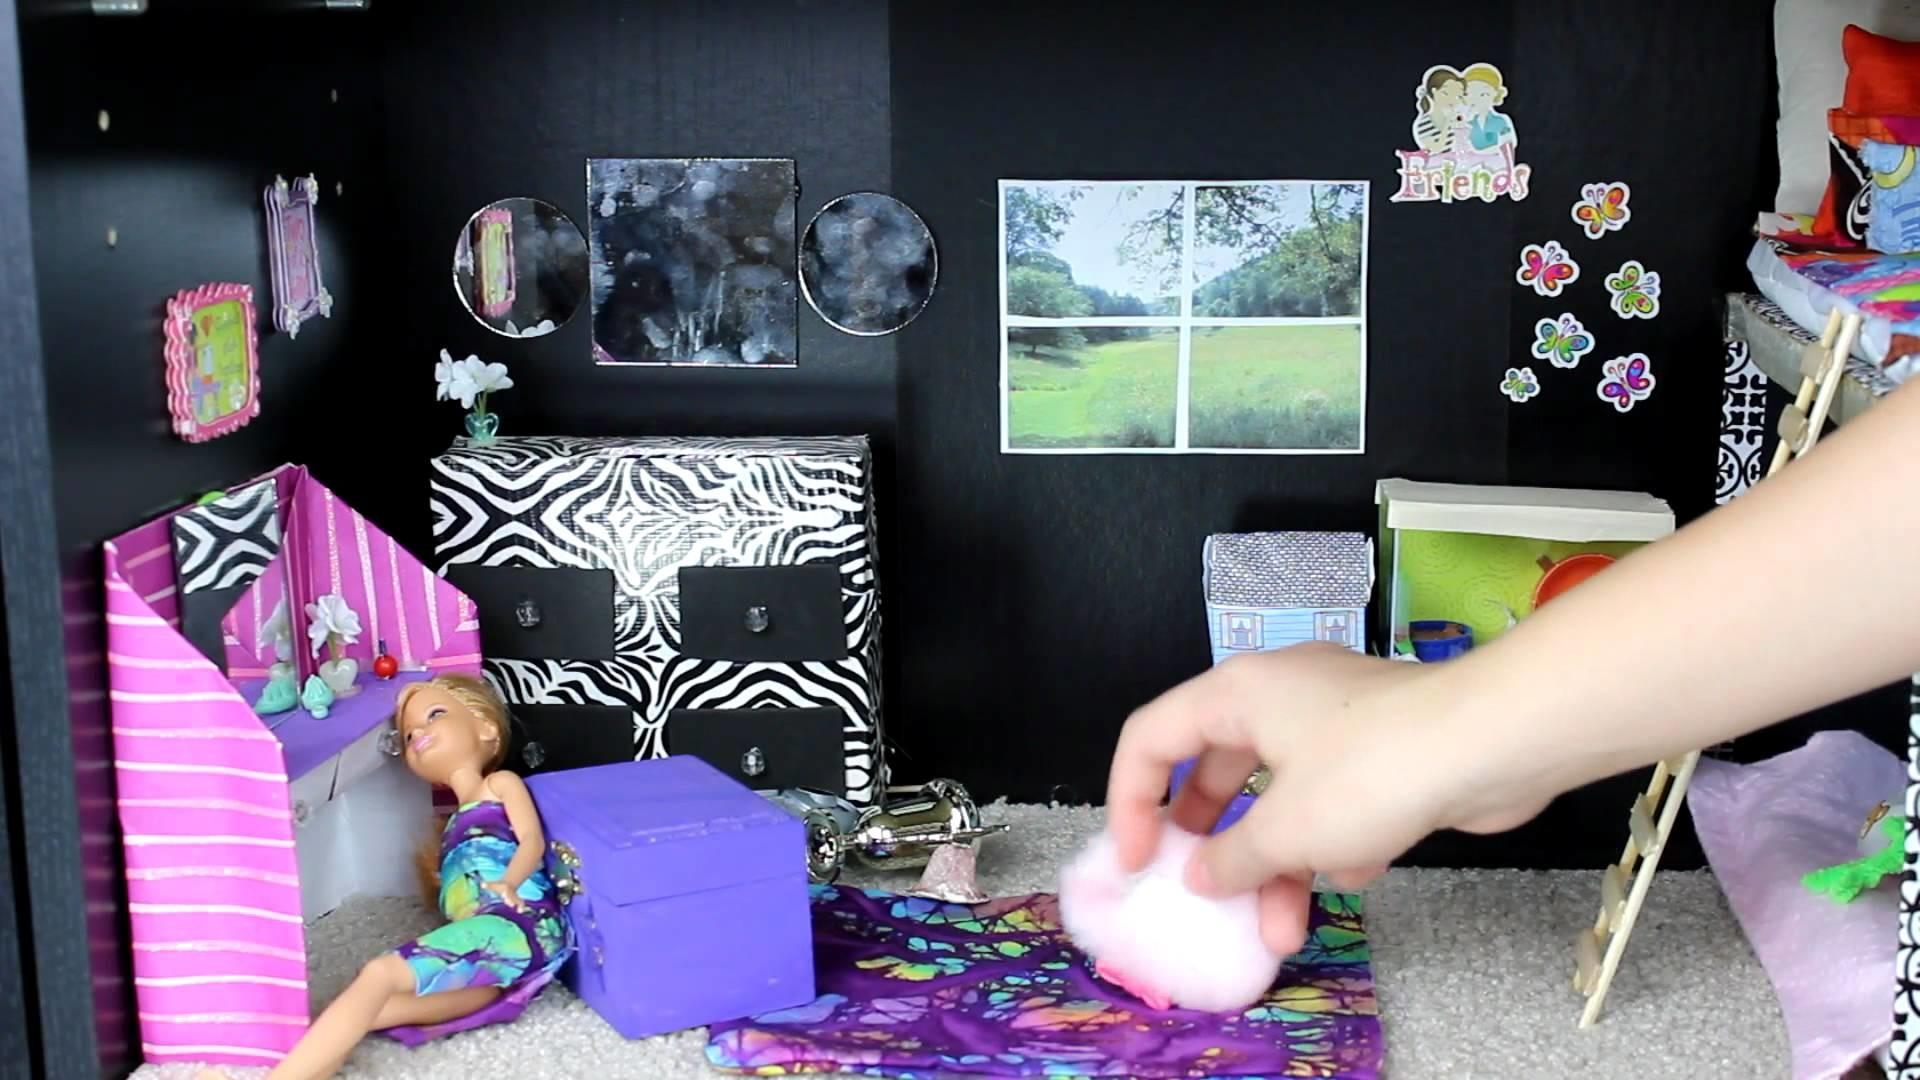 Custom Barbie House with Homemade Toys